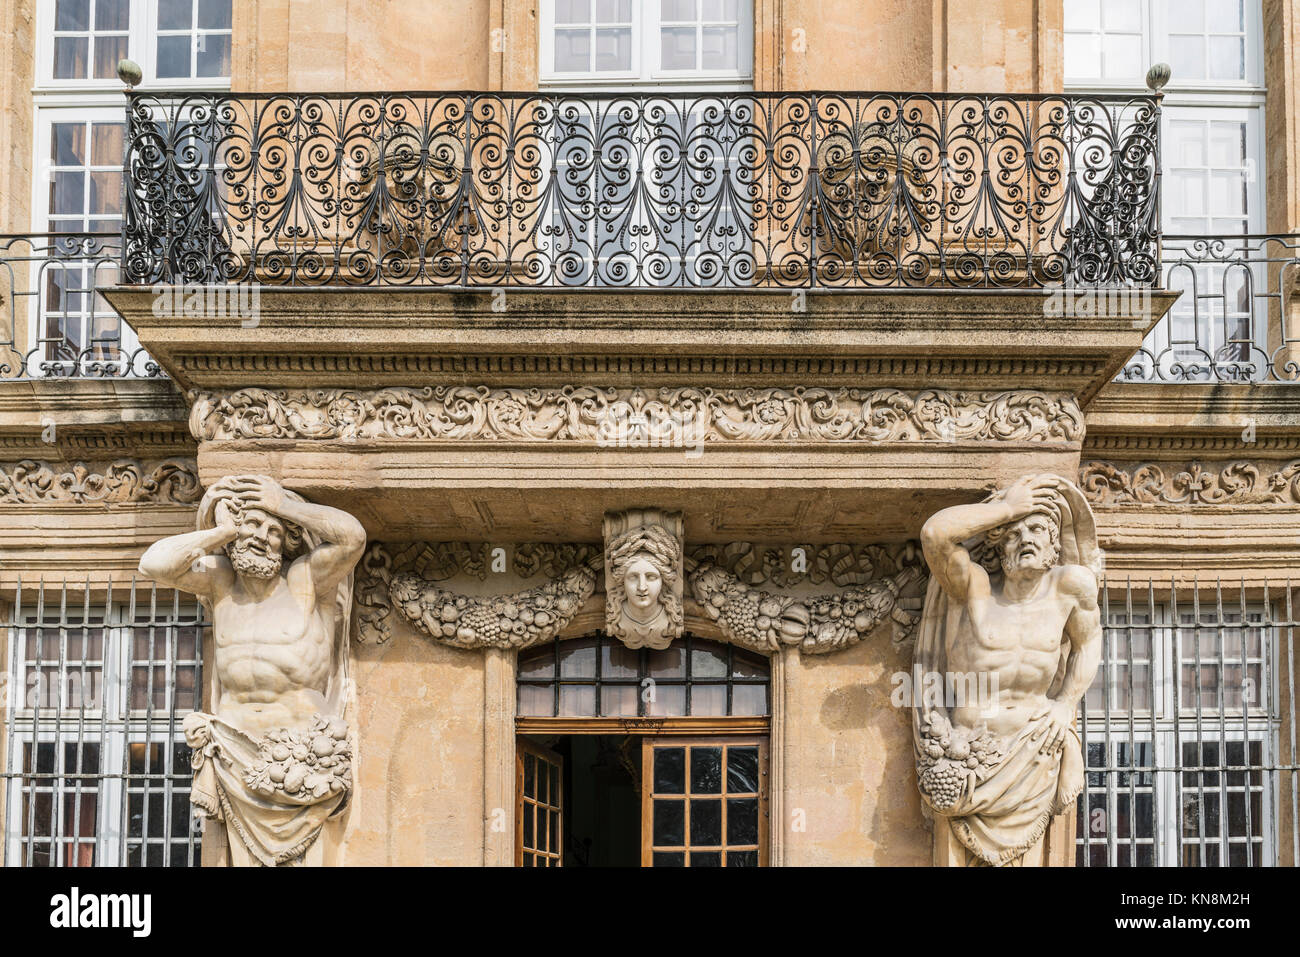 Fassade des Pavillon Vendome, Aix-En-Provence, Frankreich Stockbild